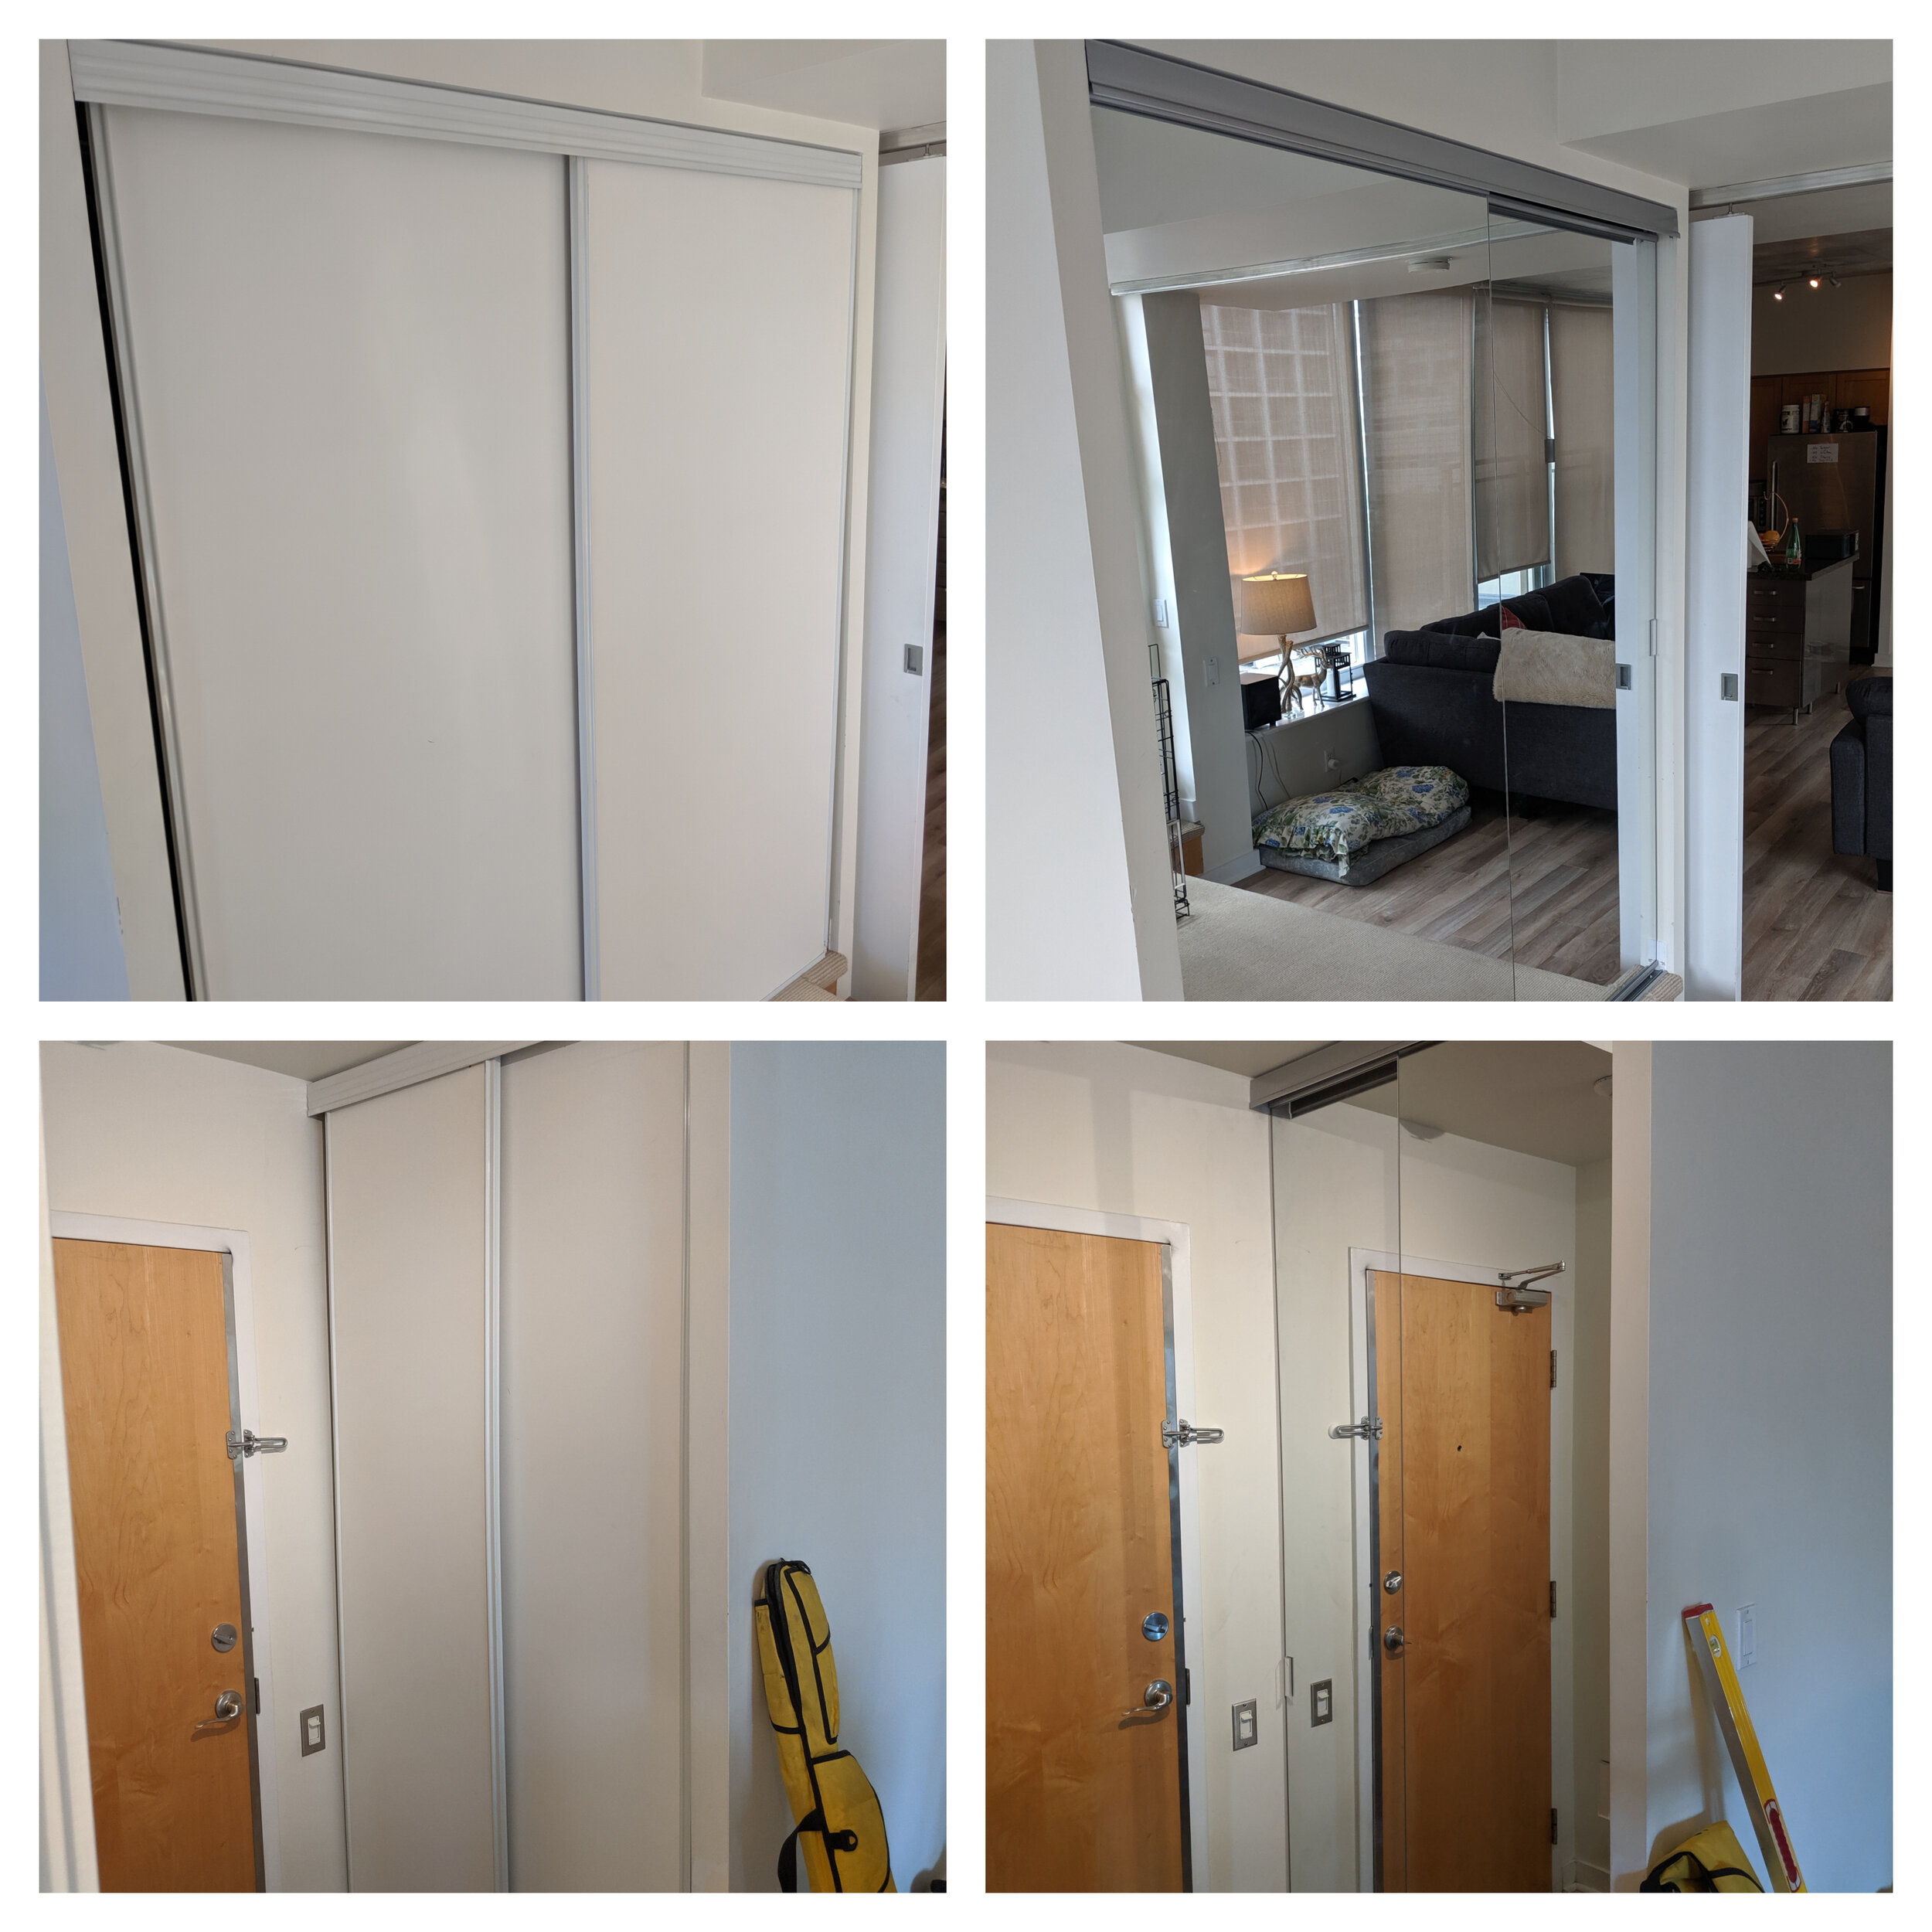 Sliding Closet Doors Installation And Repair Fix It Friend Handyman Services In Downtown Toronto